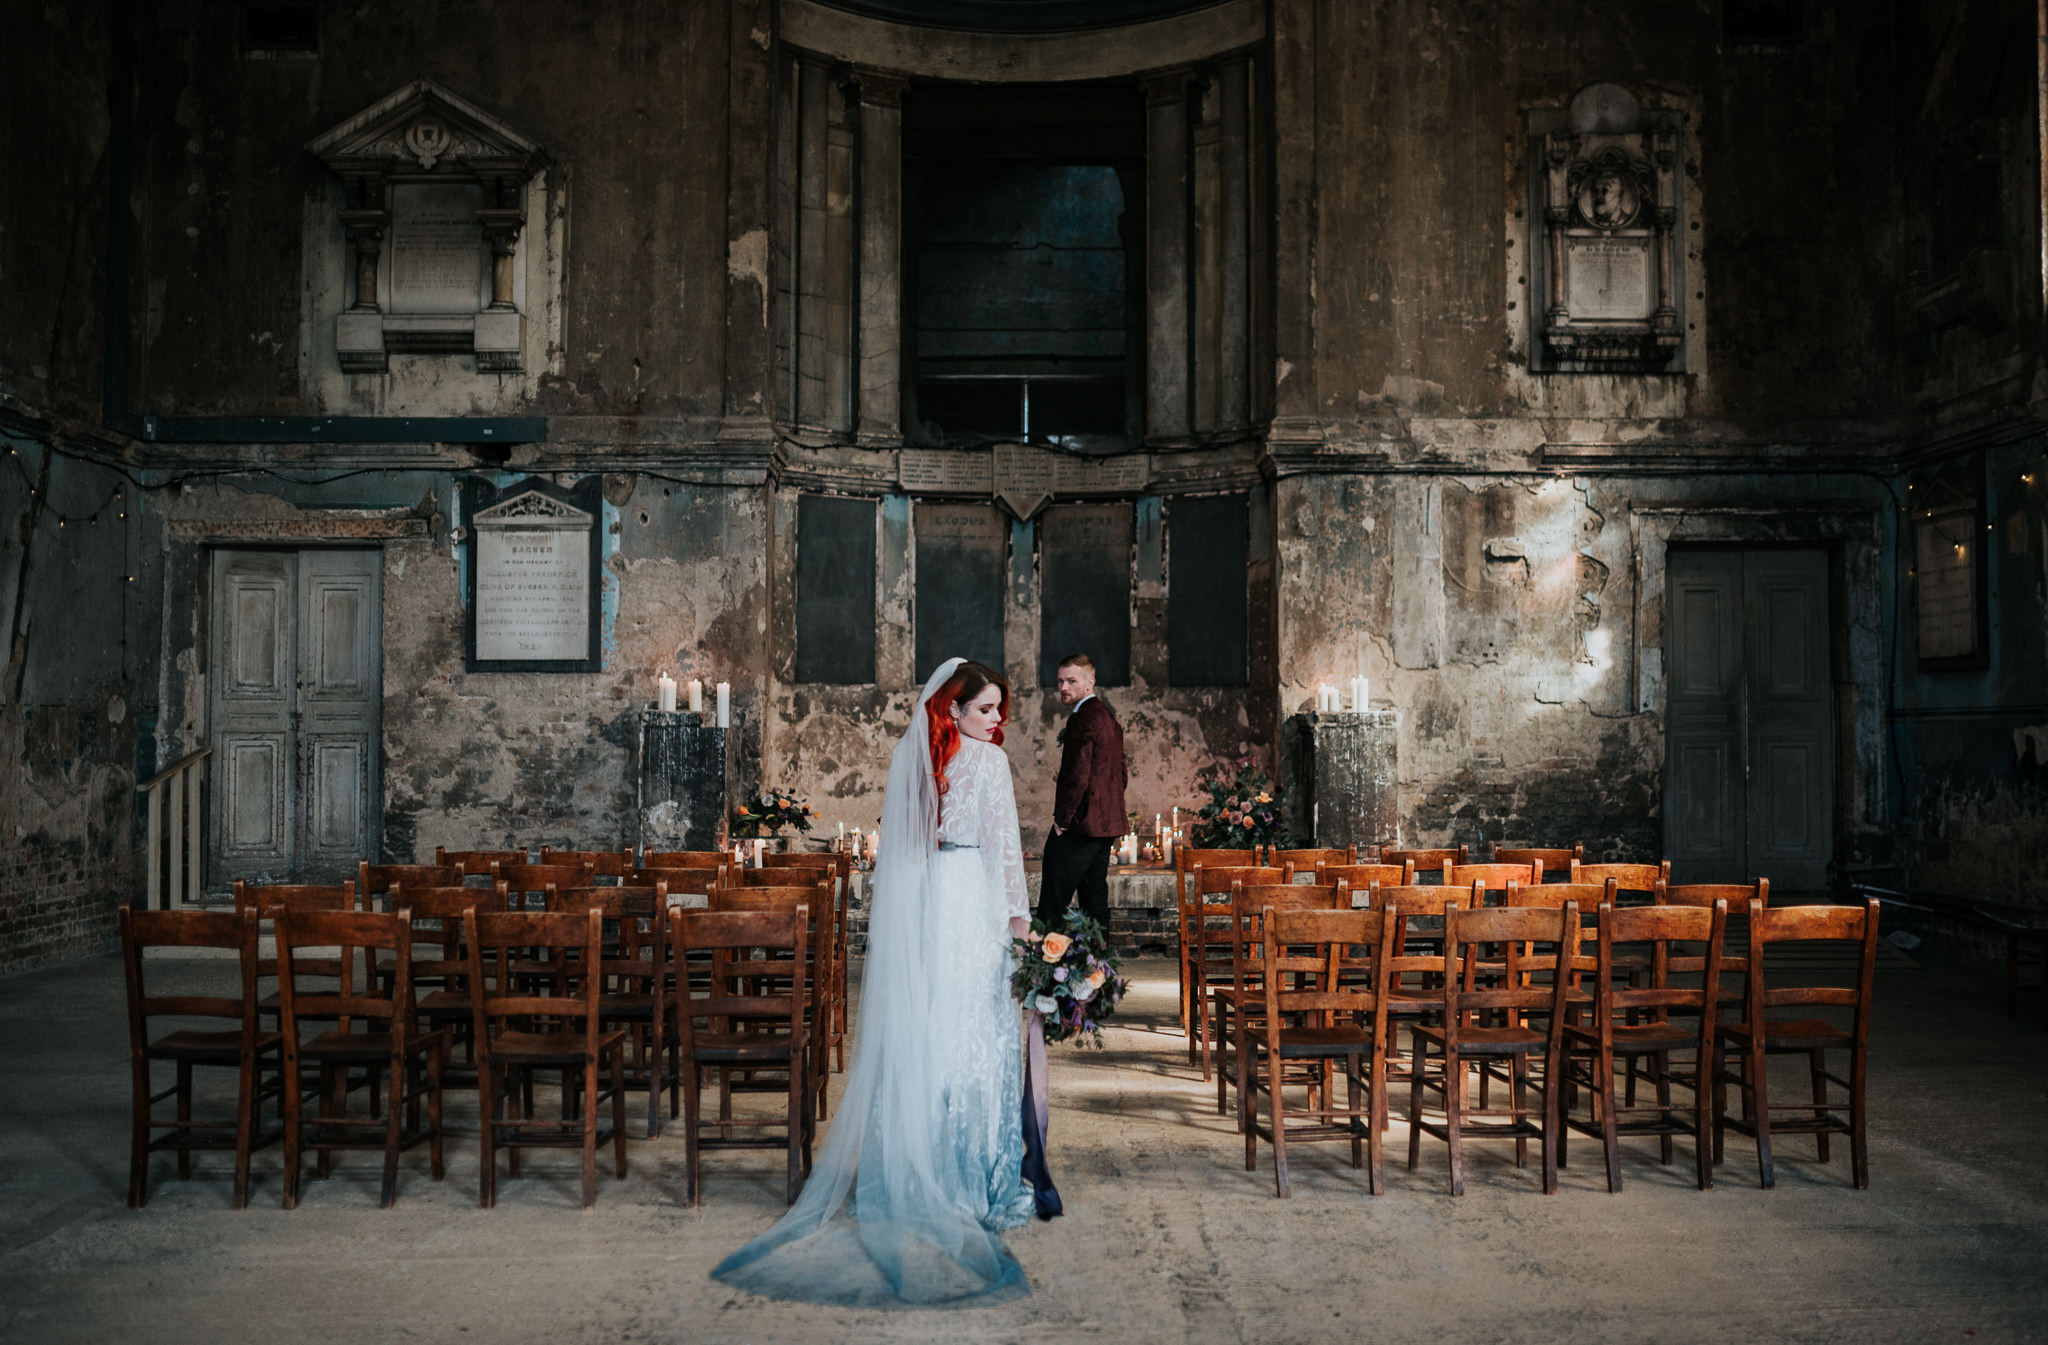 alternative chapel wedding- asylum london- unique london wedding venue- london wedding venue- Jenny Appleton Photography- gothic wedding venue- dip dye wedding dress